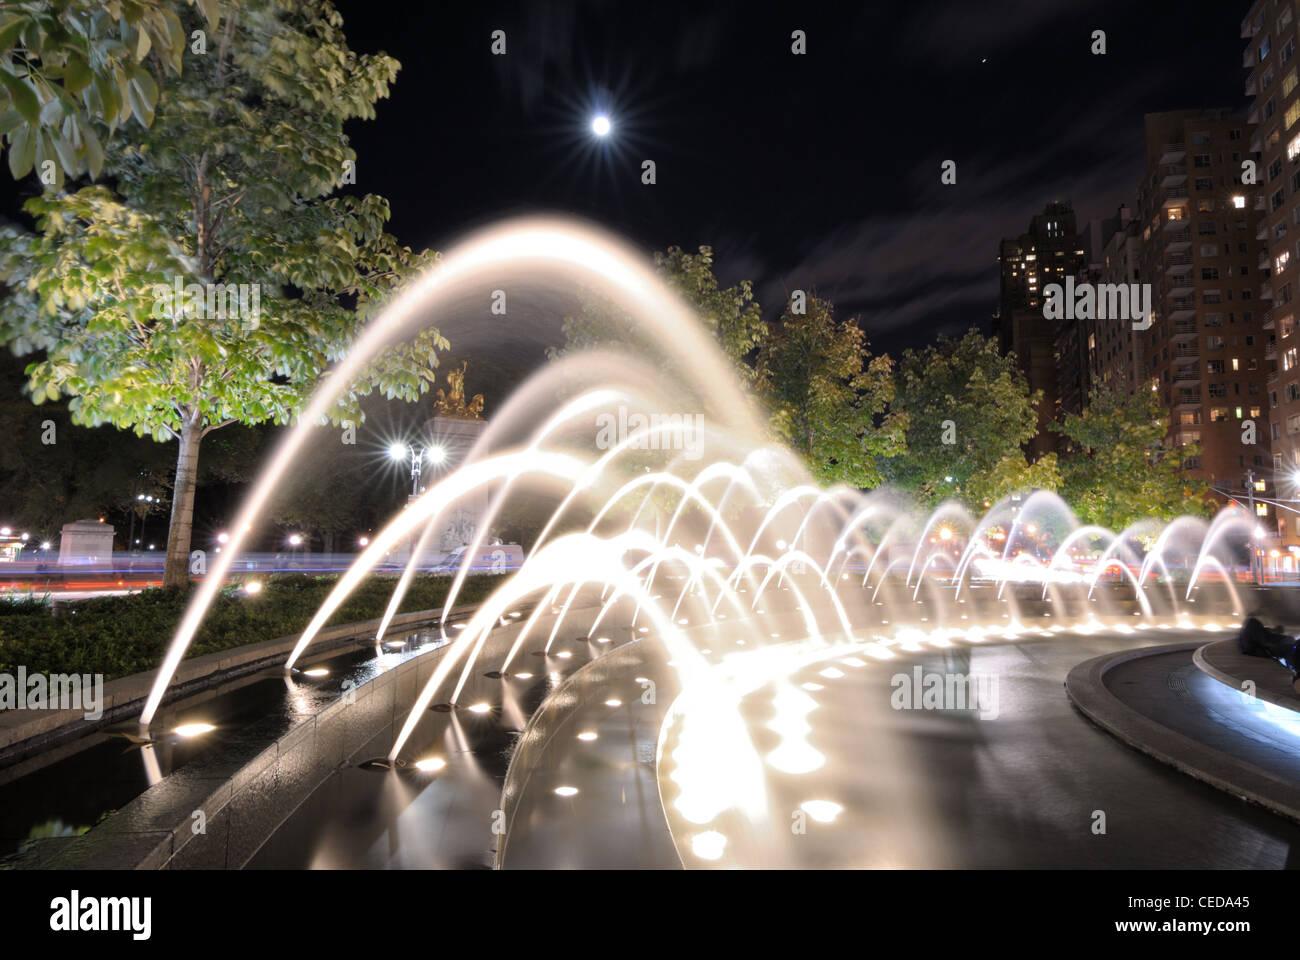 Spray di fontane a Columbus Circle a New York City. Immagini Stock